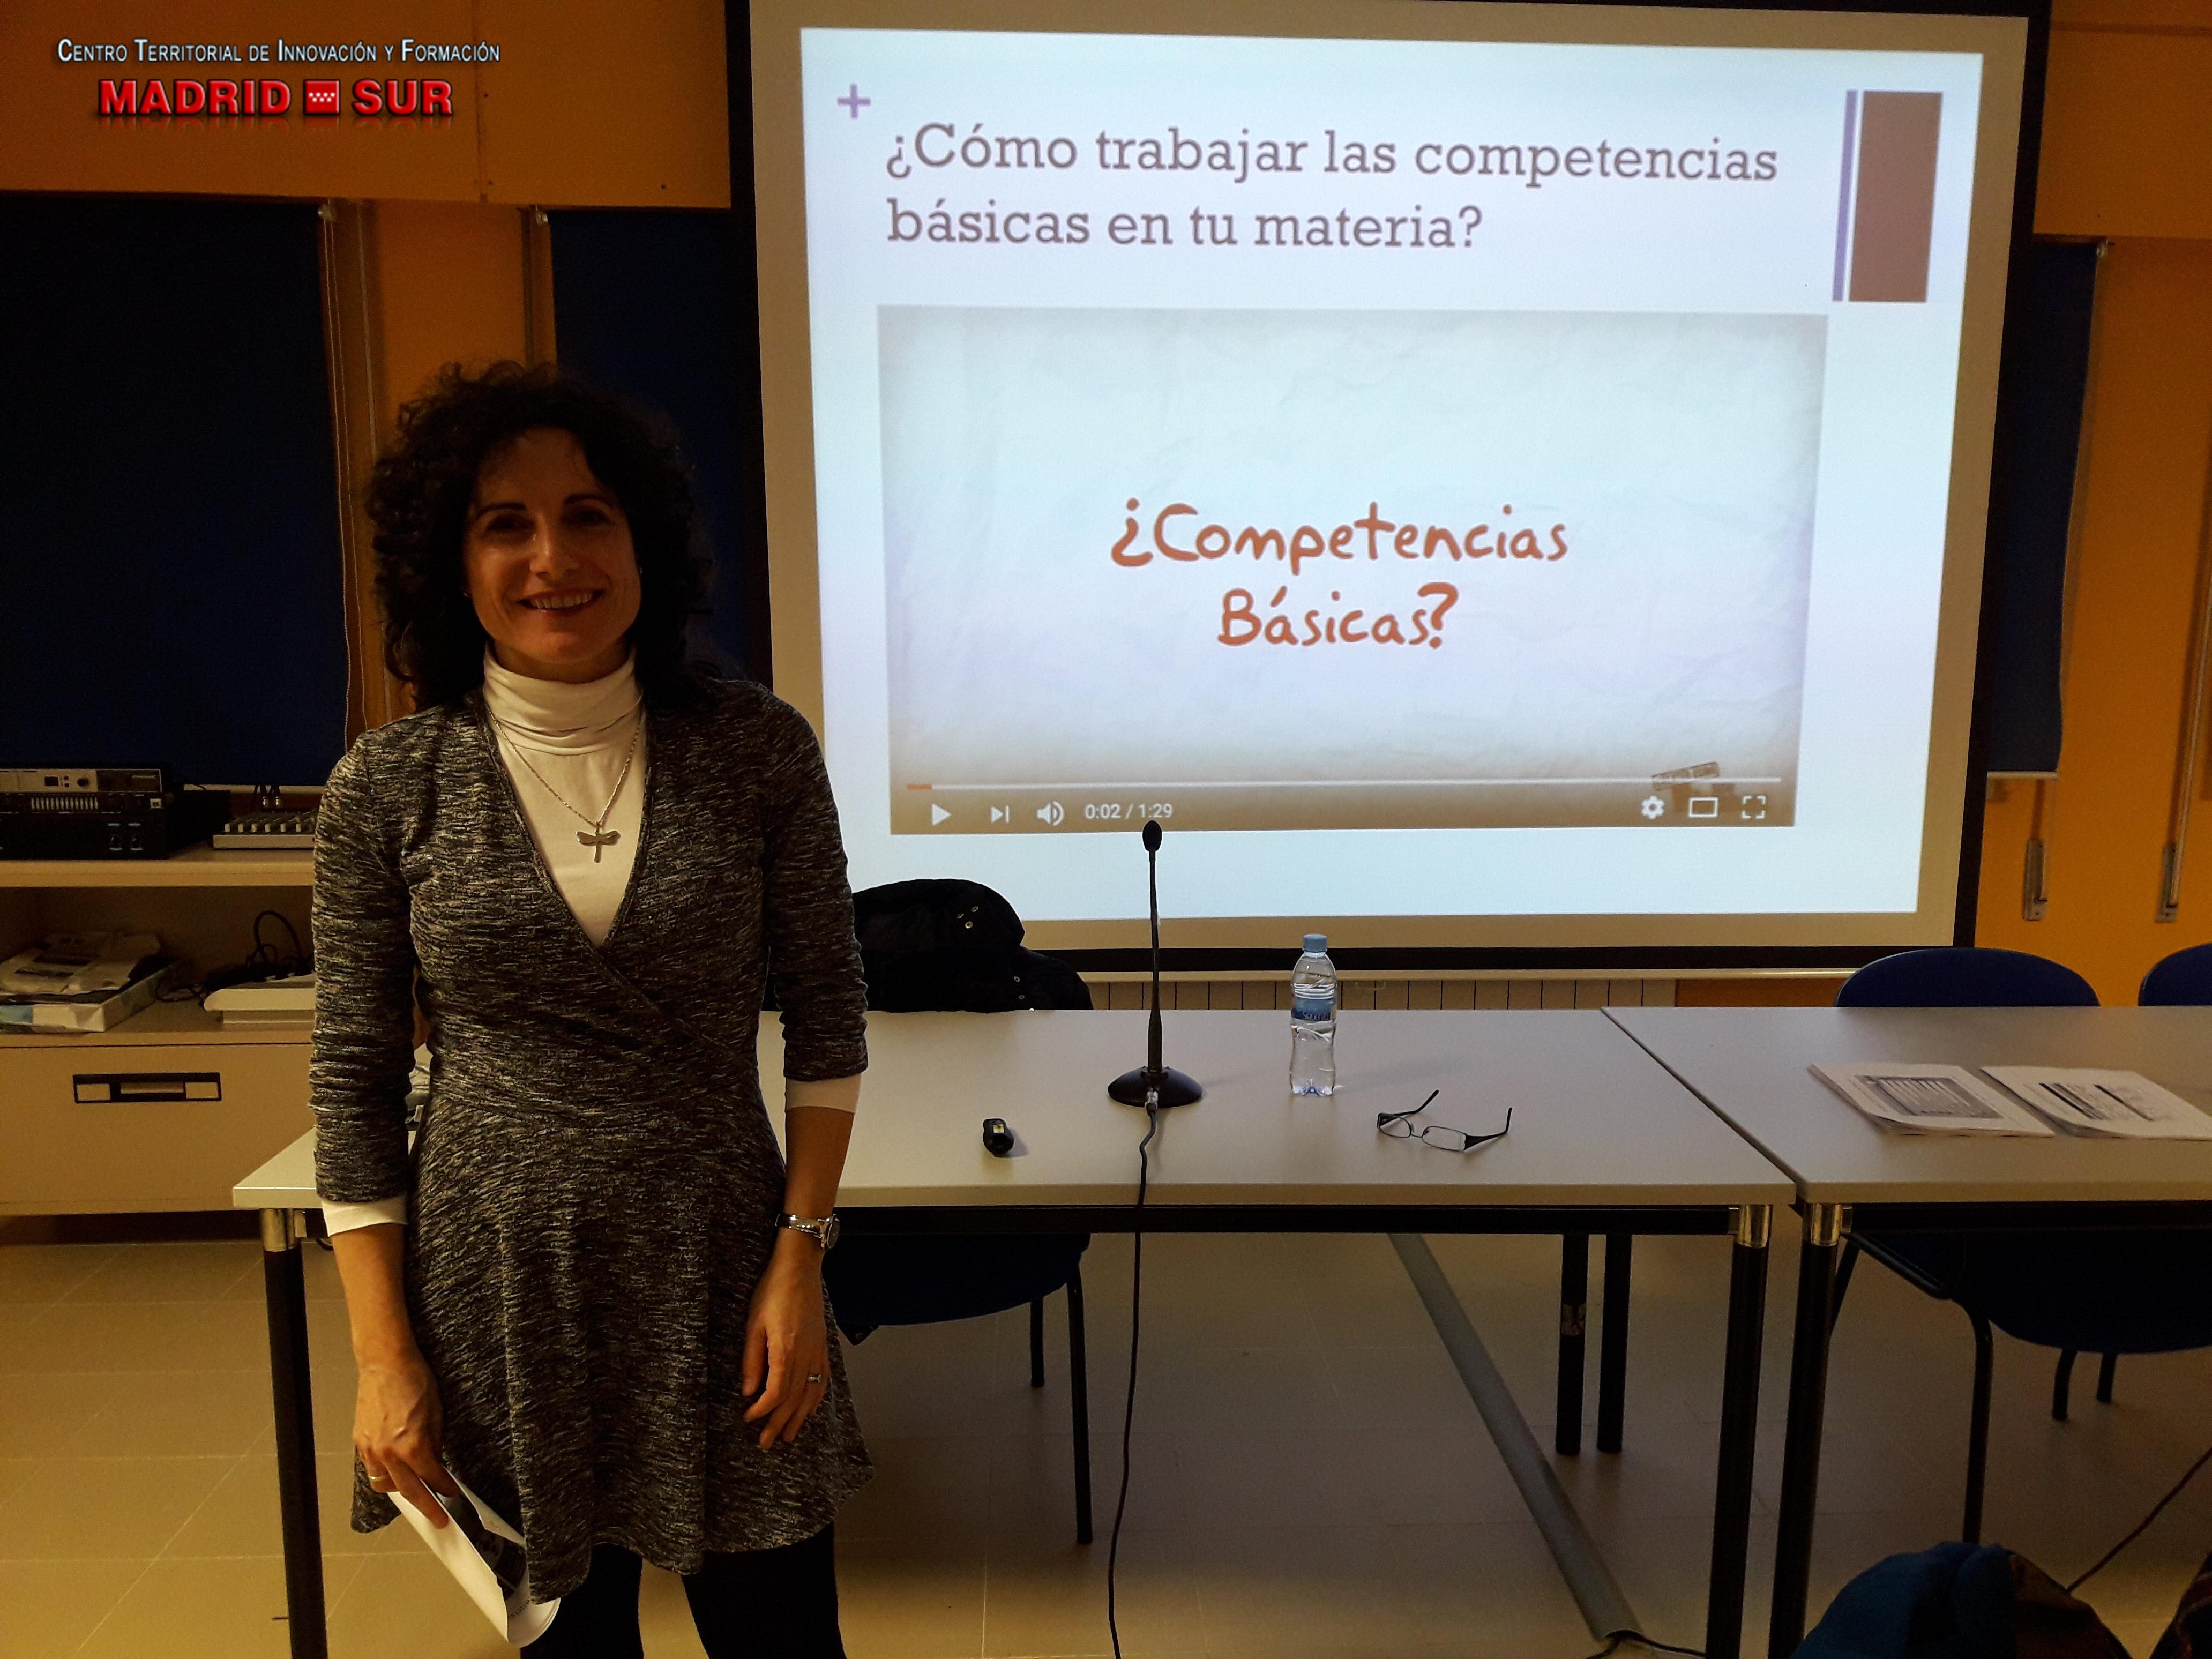 Ponencia de Dña. María Goretti Alonso de Castro